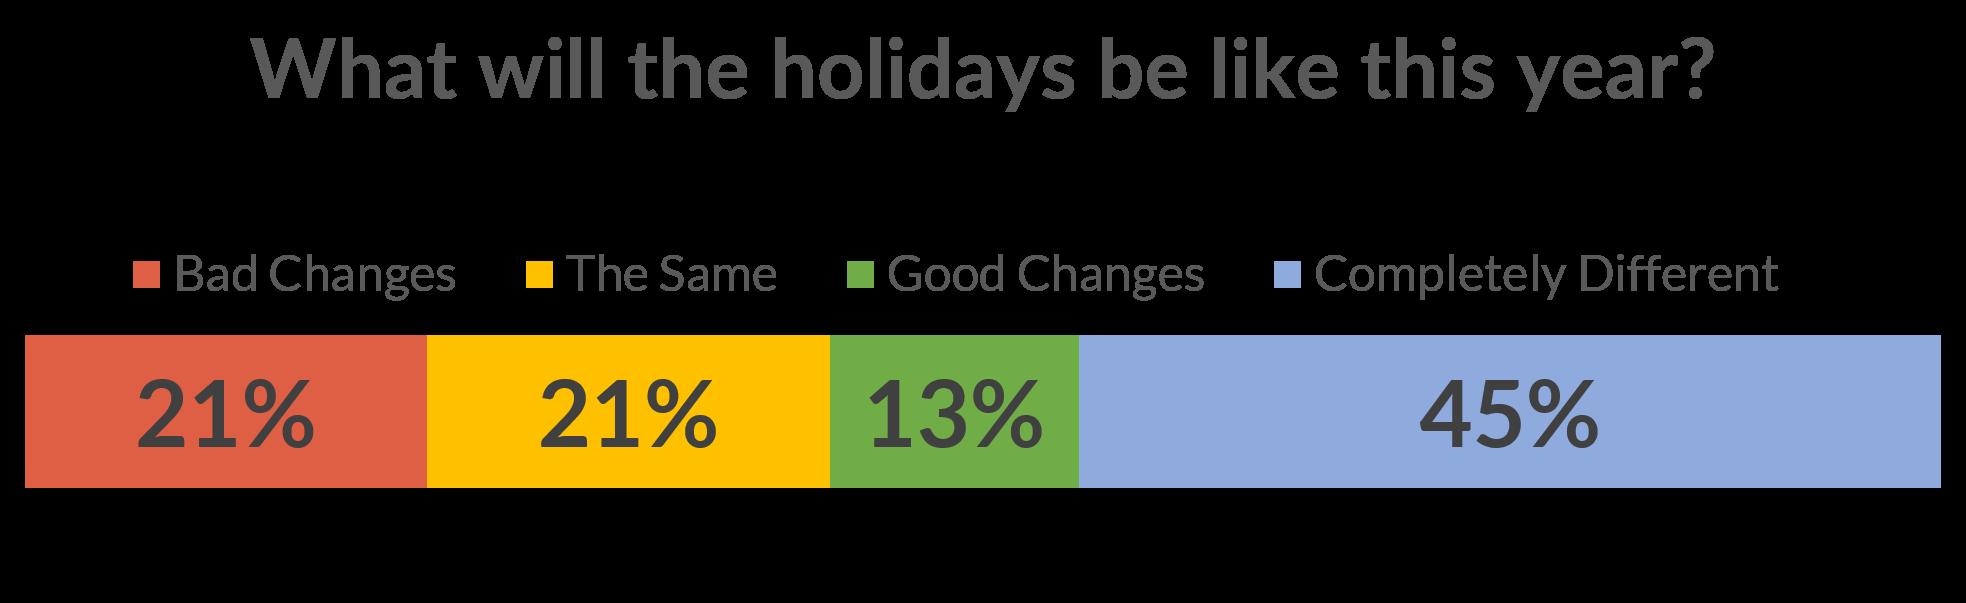 10-18 Holiday expectation